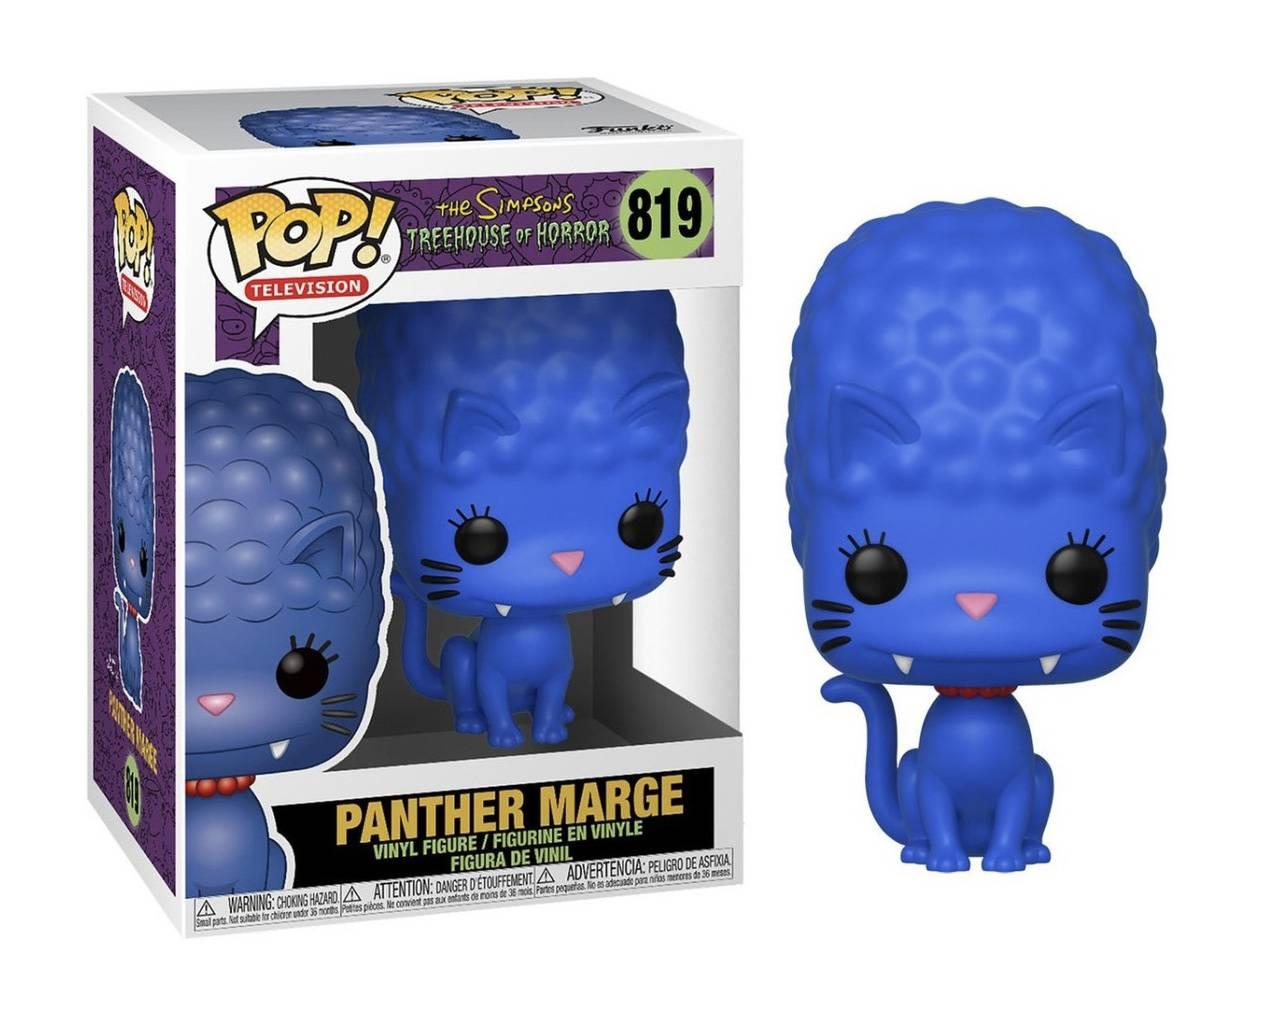 Panther Marge Pop! Vinyl